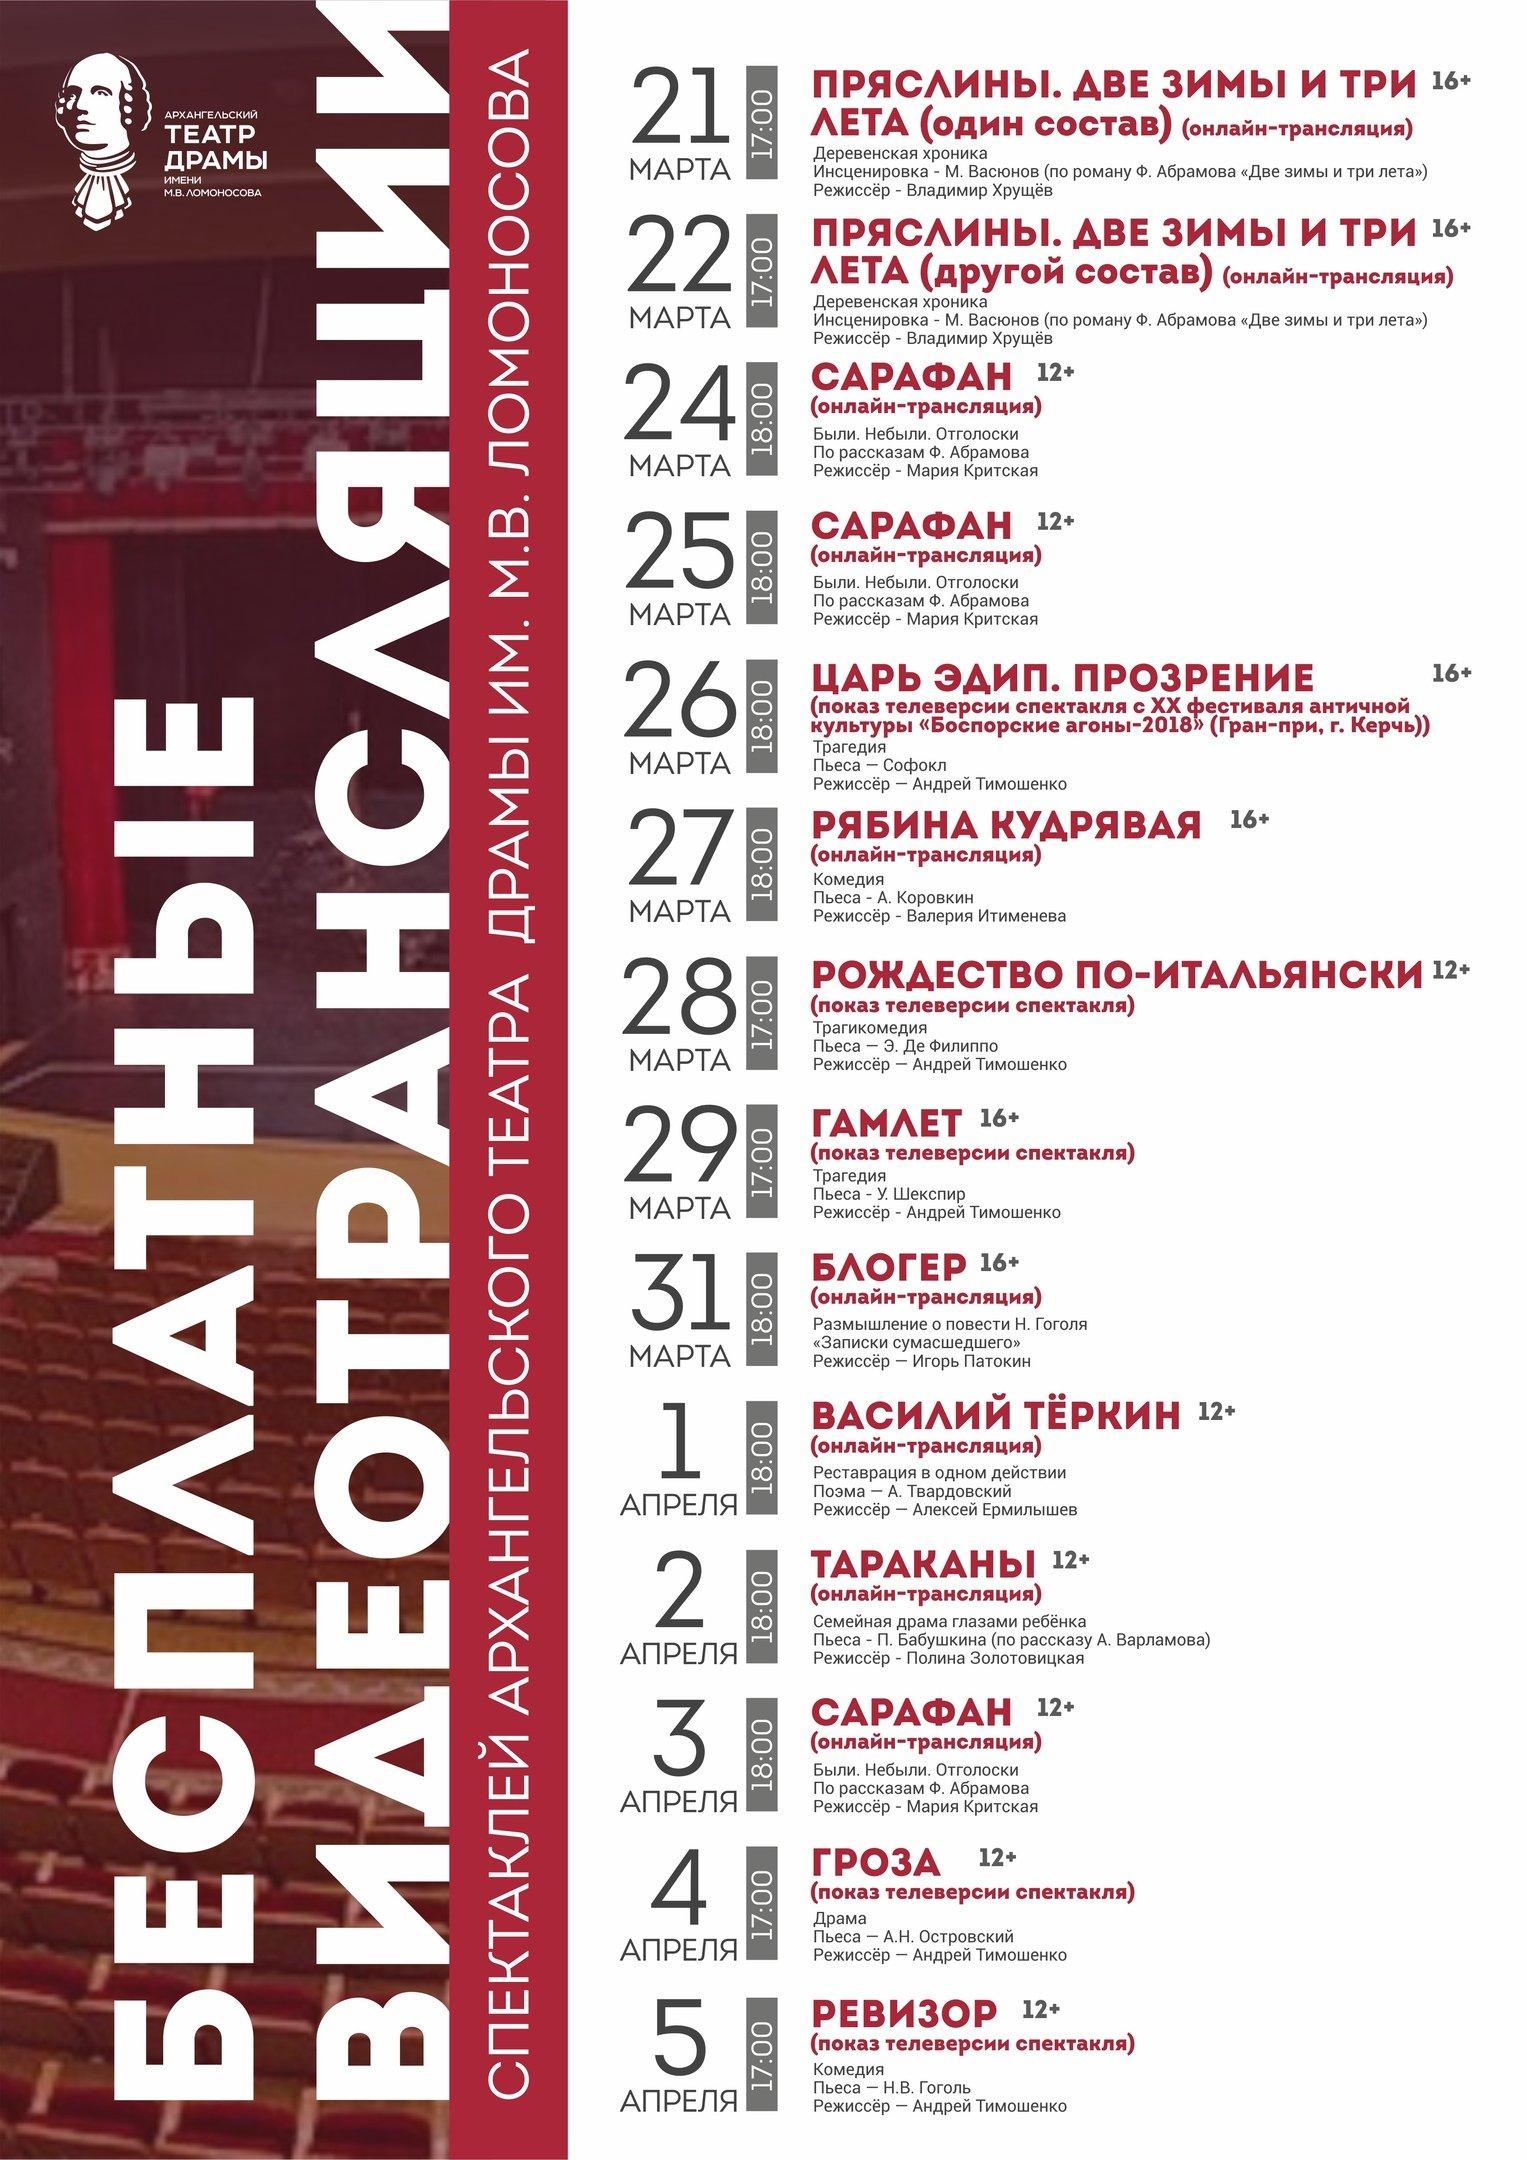 Arhangelskij-teatr-dramy